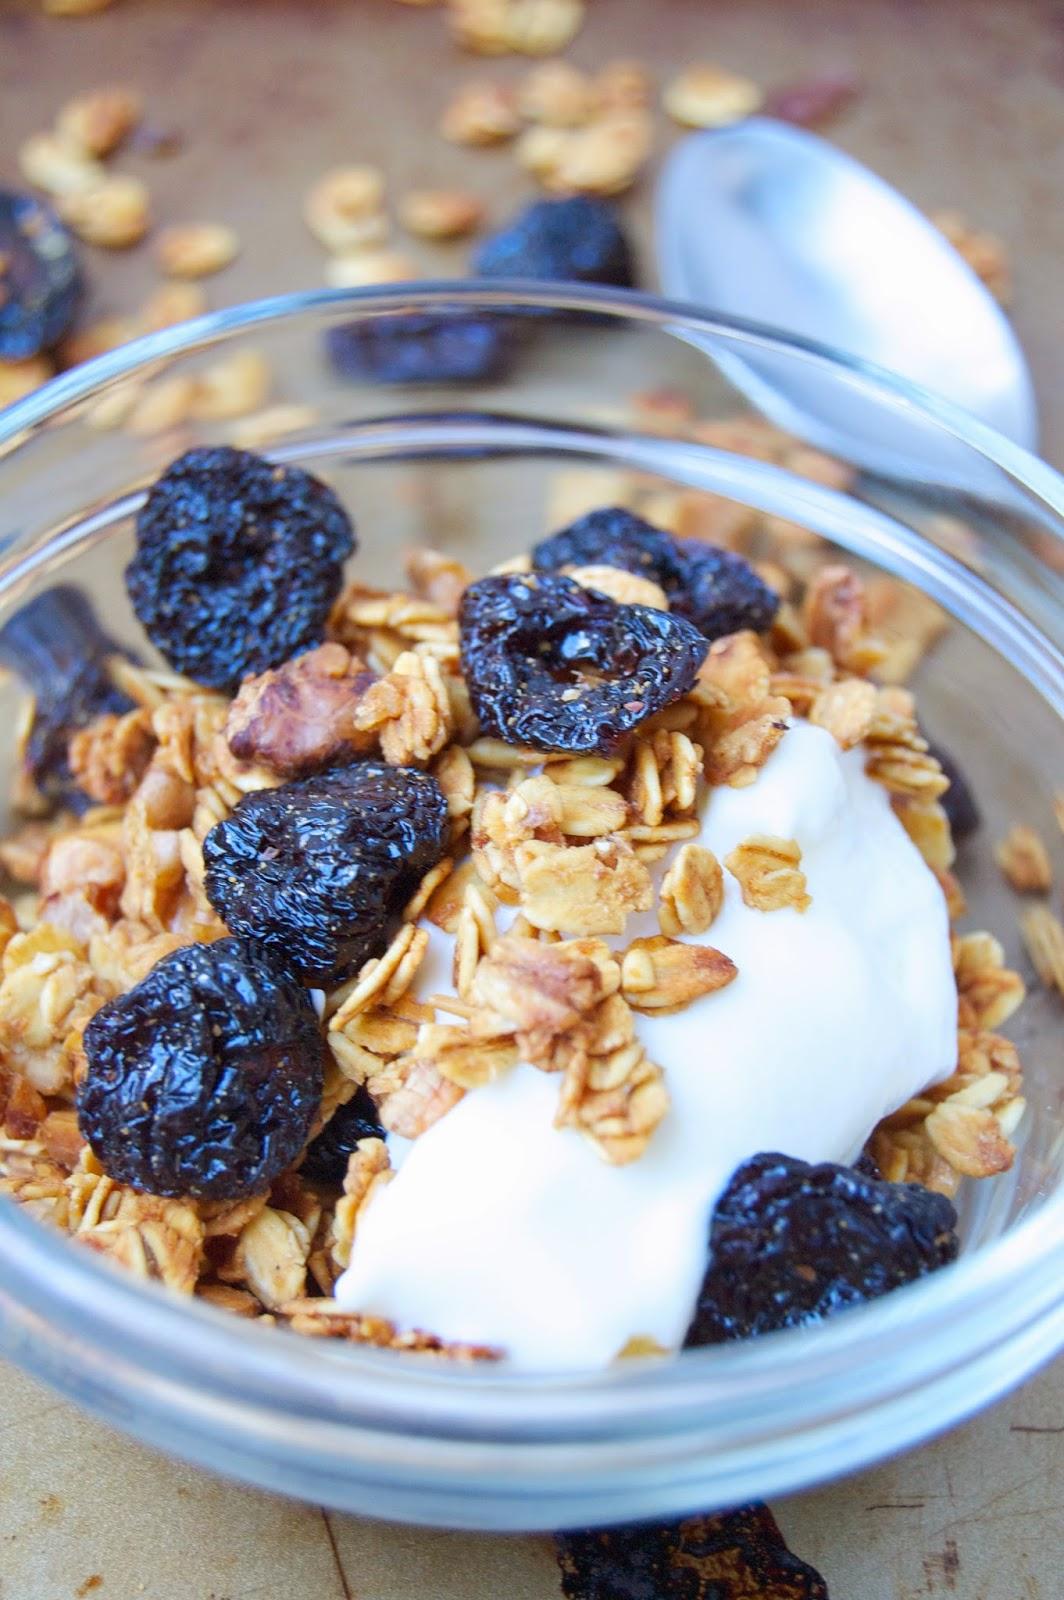 Cherry Walnut Granola | www.kettlercuisine.com